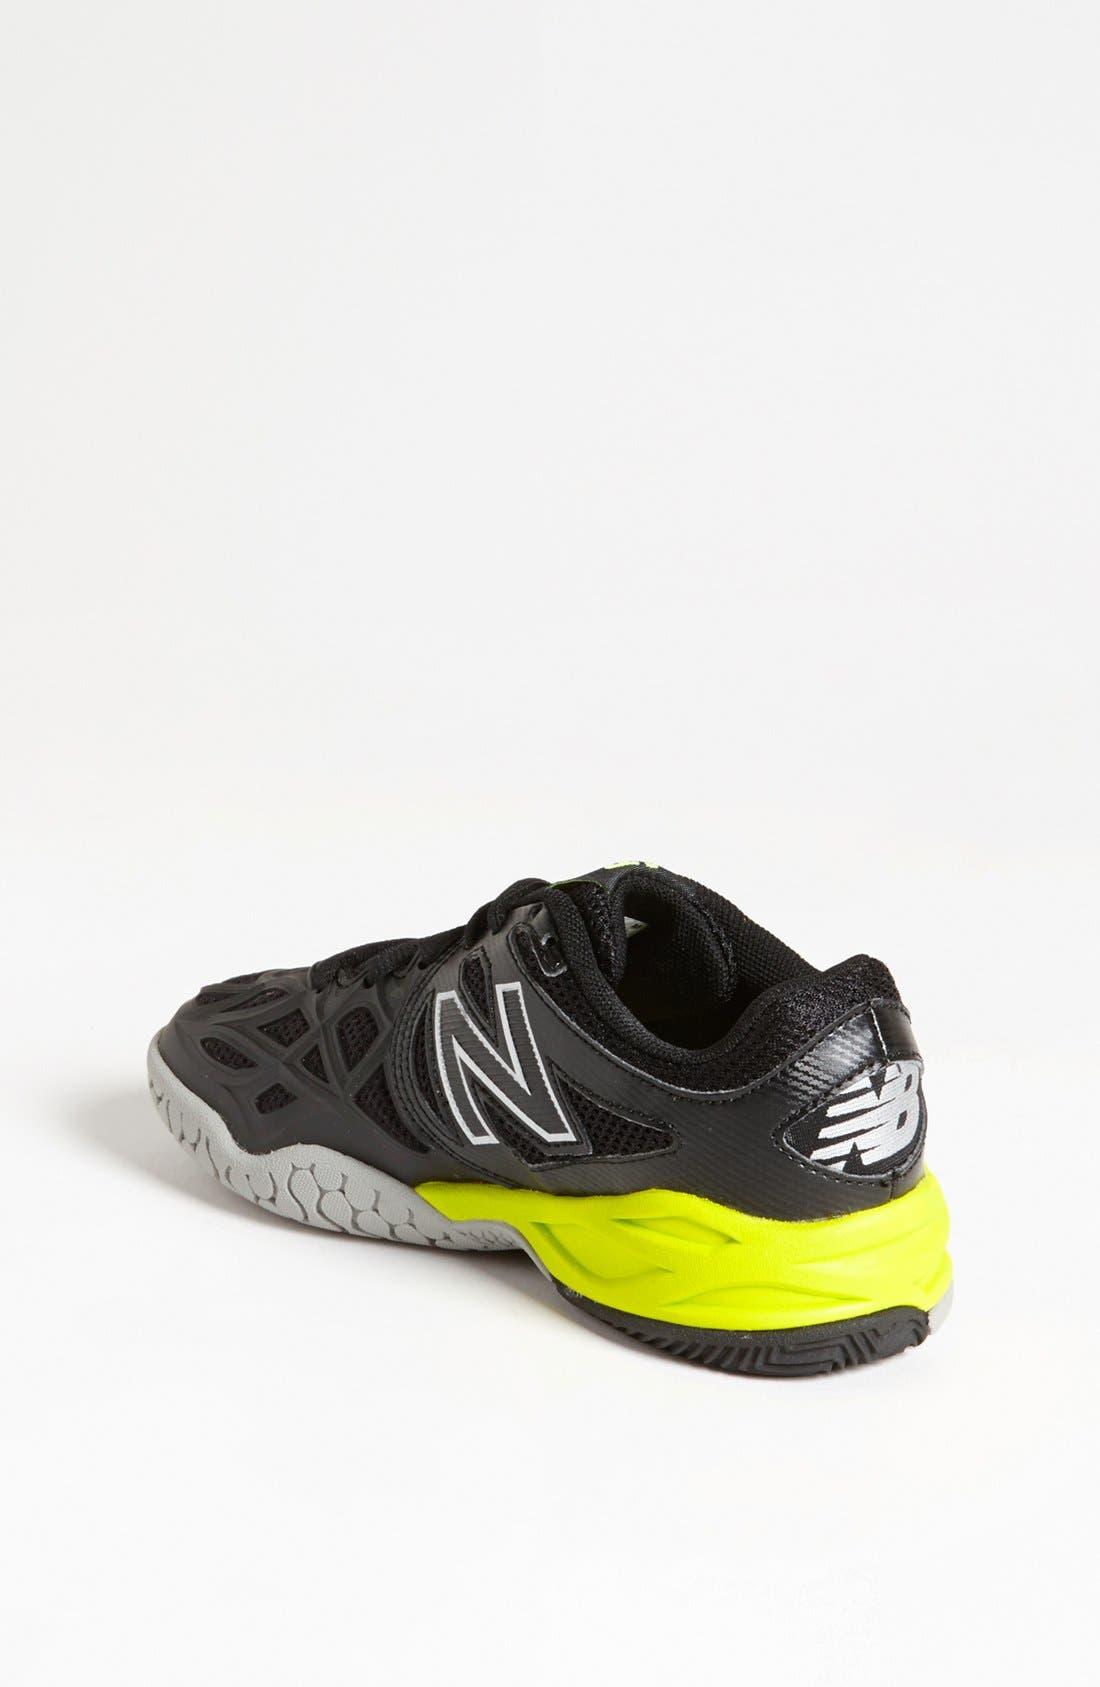 Alternate Image 2  - New Balance Tennis Shoe (Toddler, Little Kid & Big Kid)